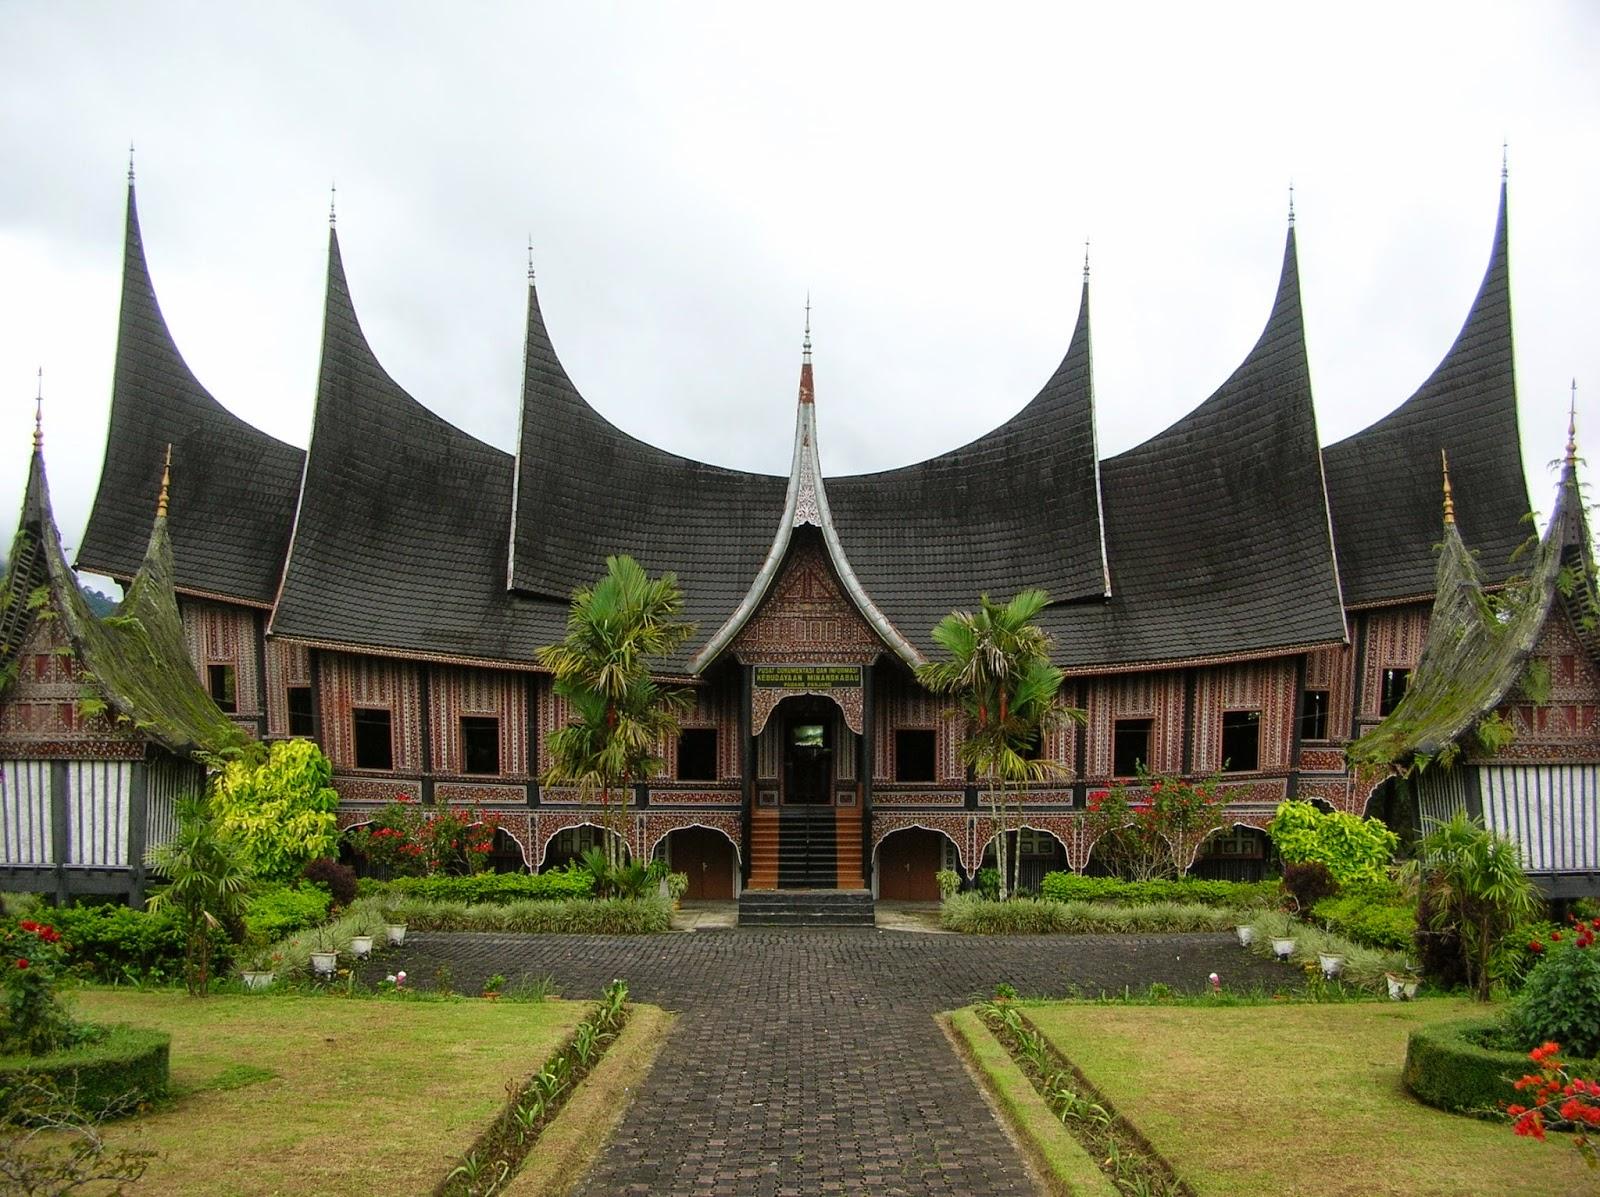 Rumah Tradisional dalam Arsitektur Kuno Austronesia